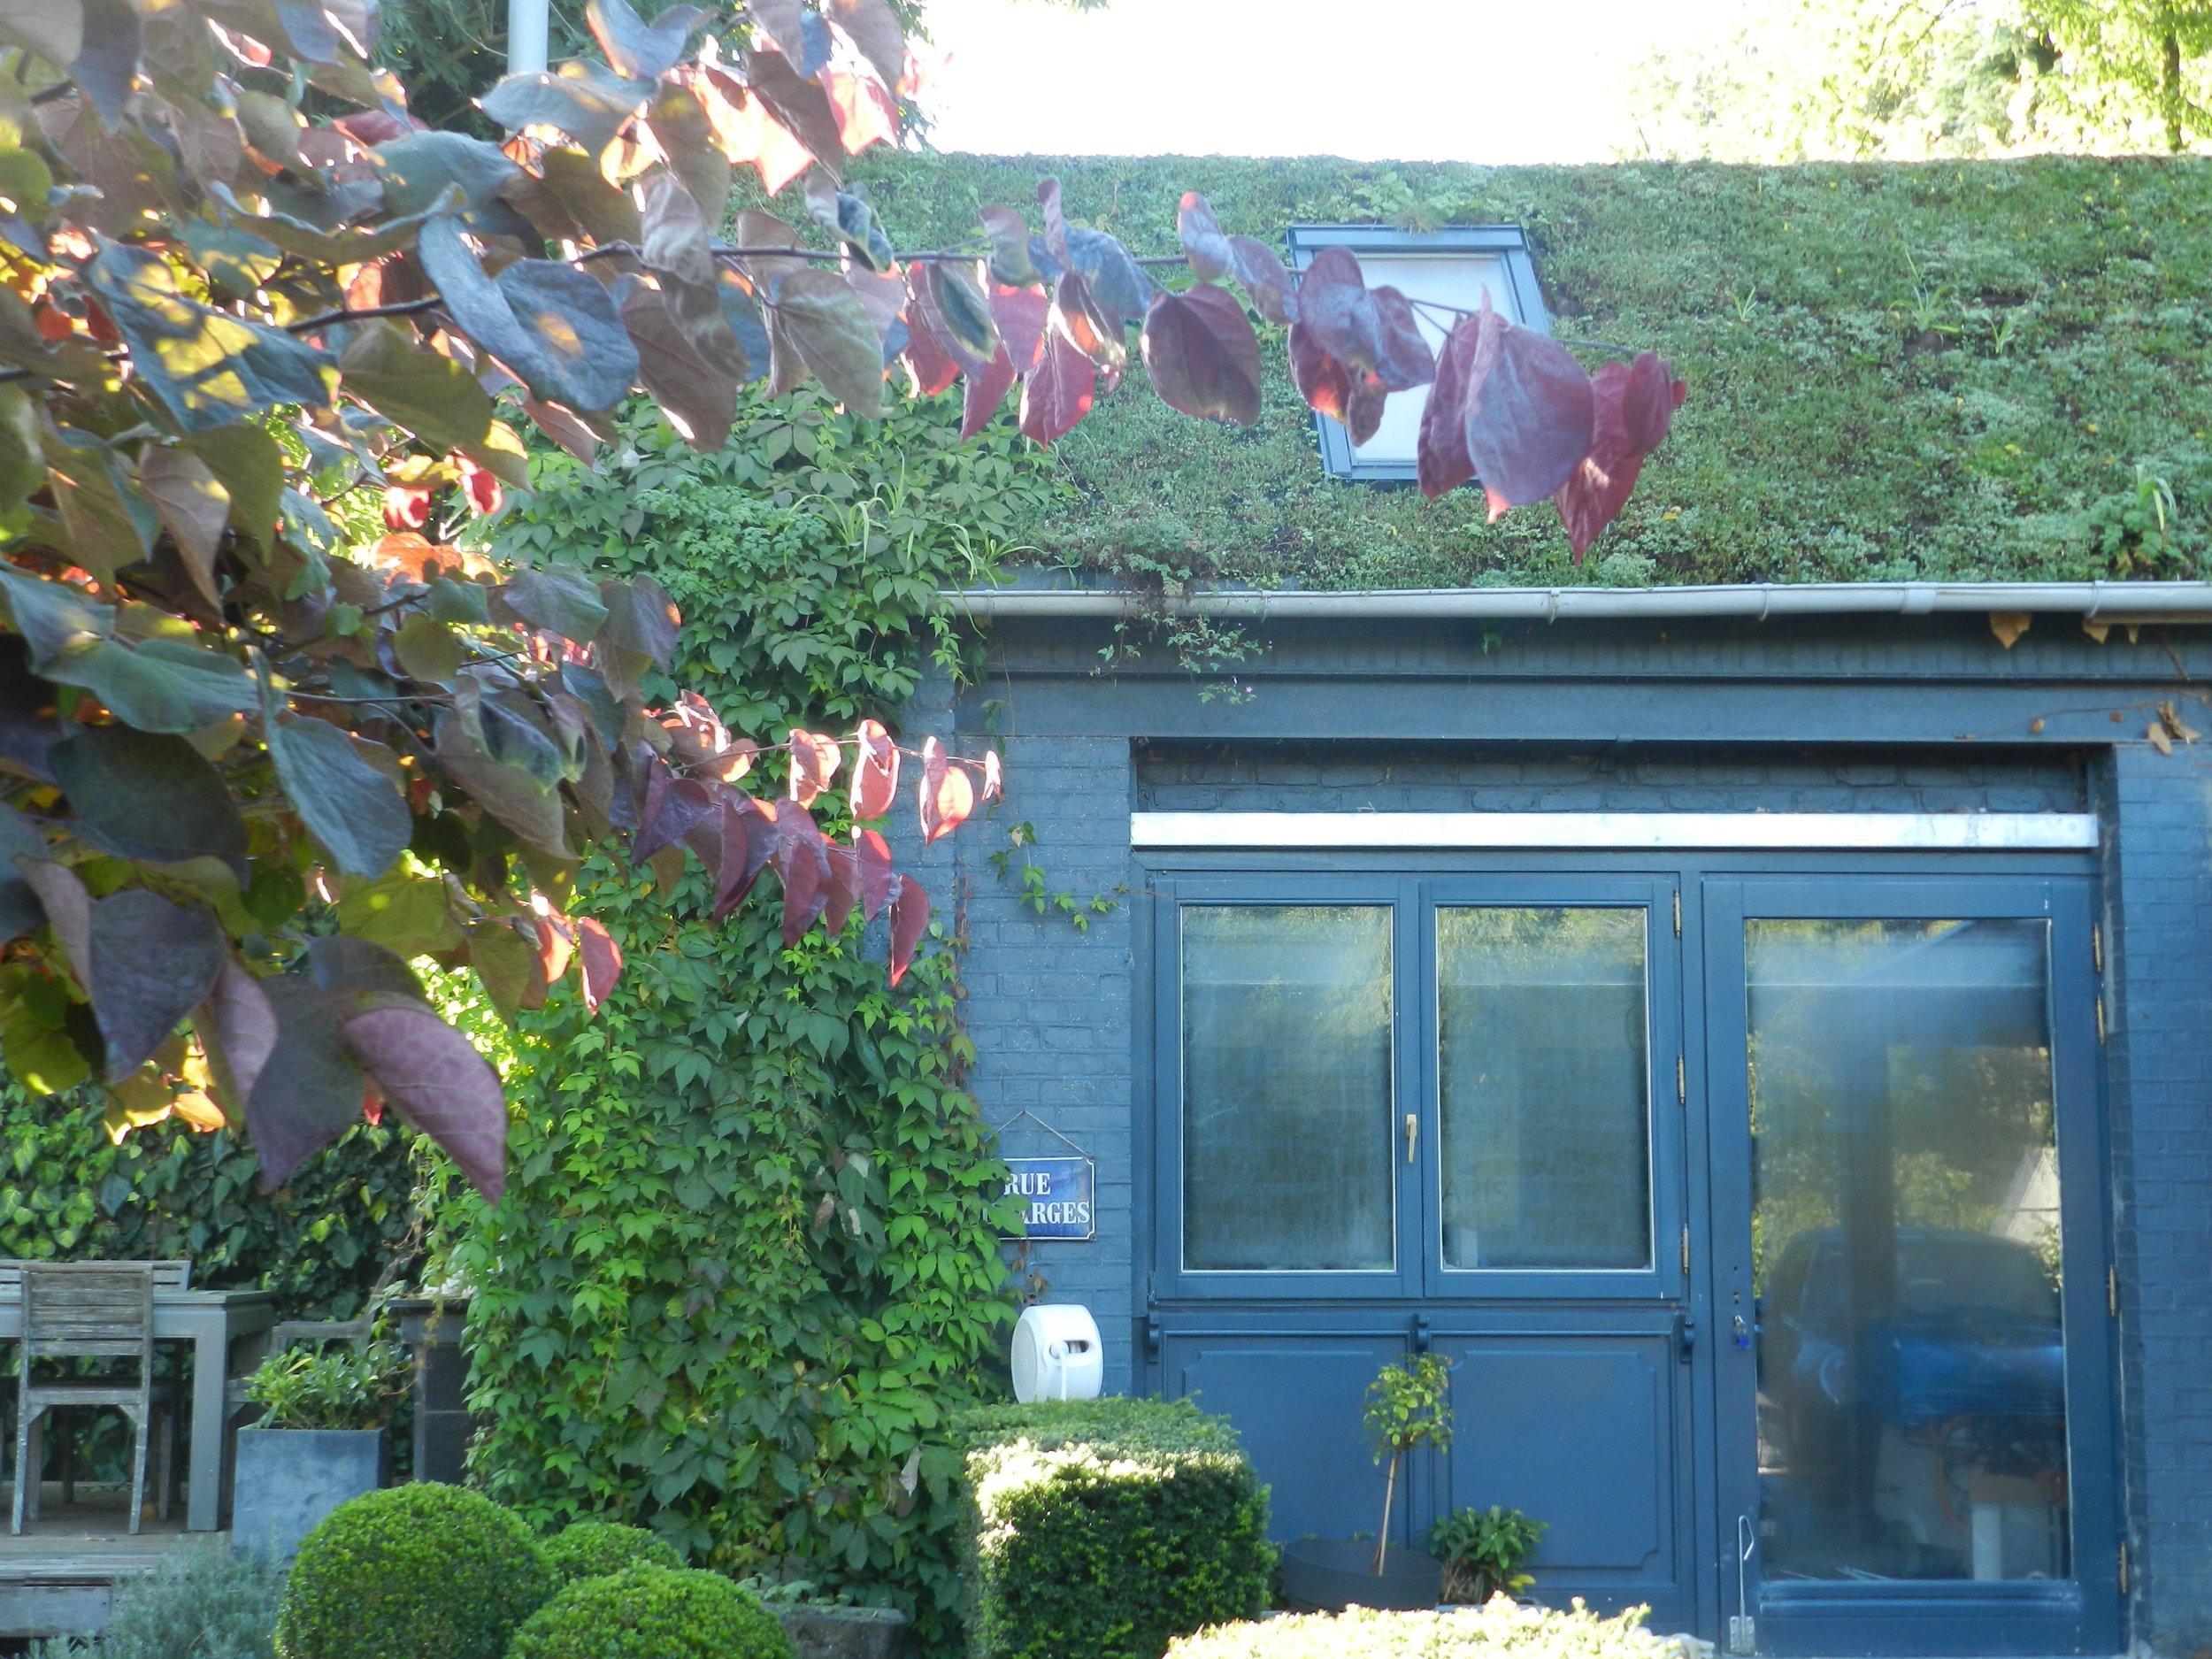 vgtex - toiture verte inclinée